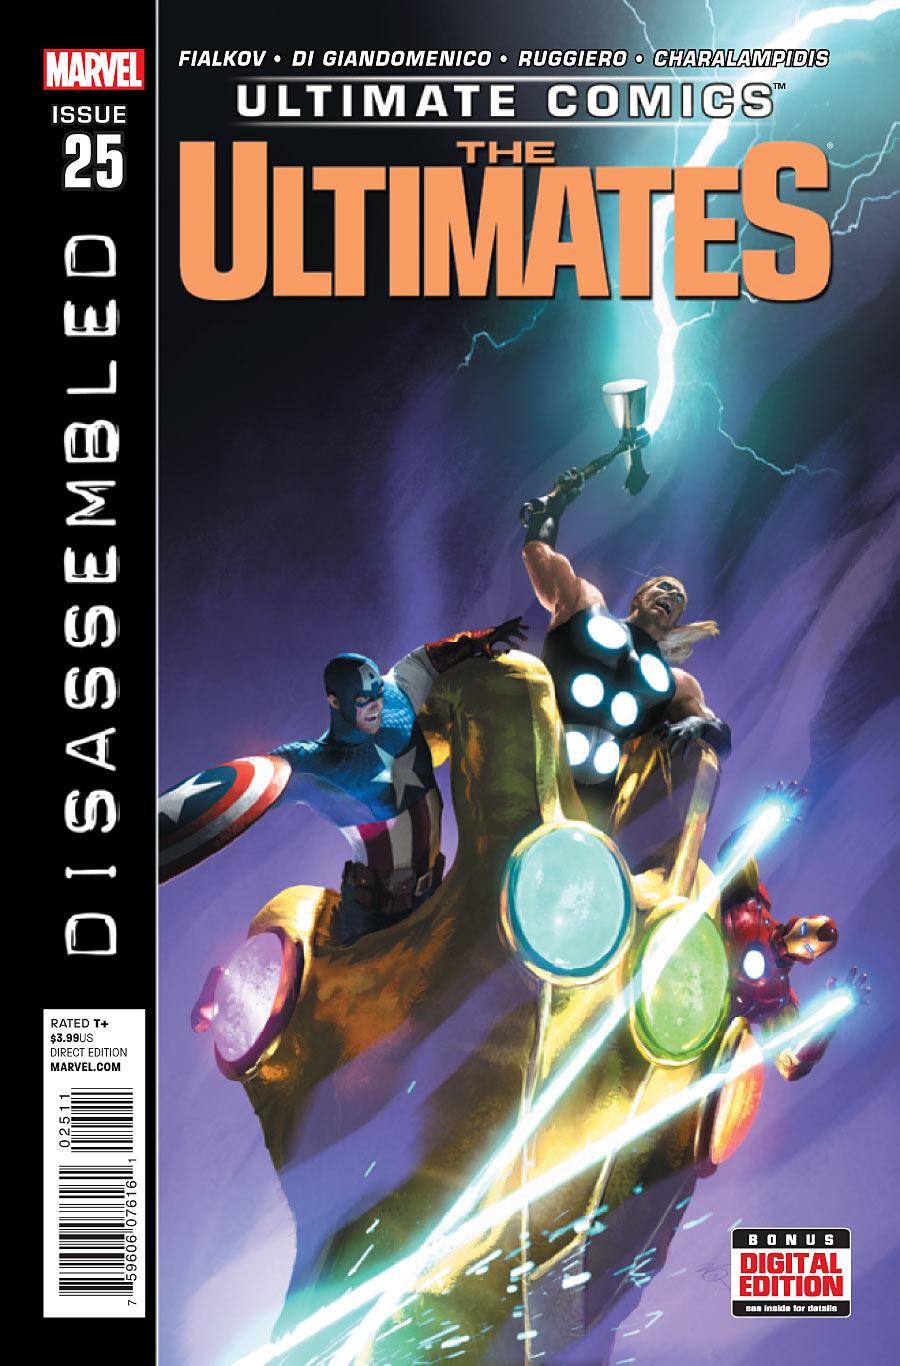 Ultimate Comics: The Ultimates #25